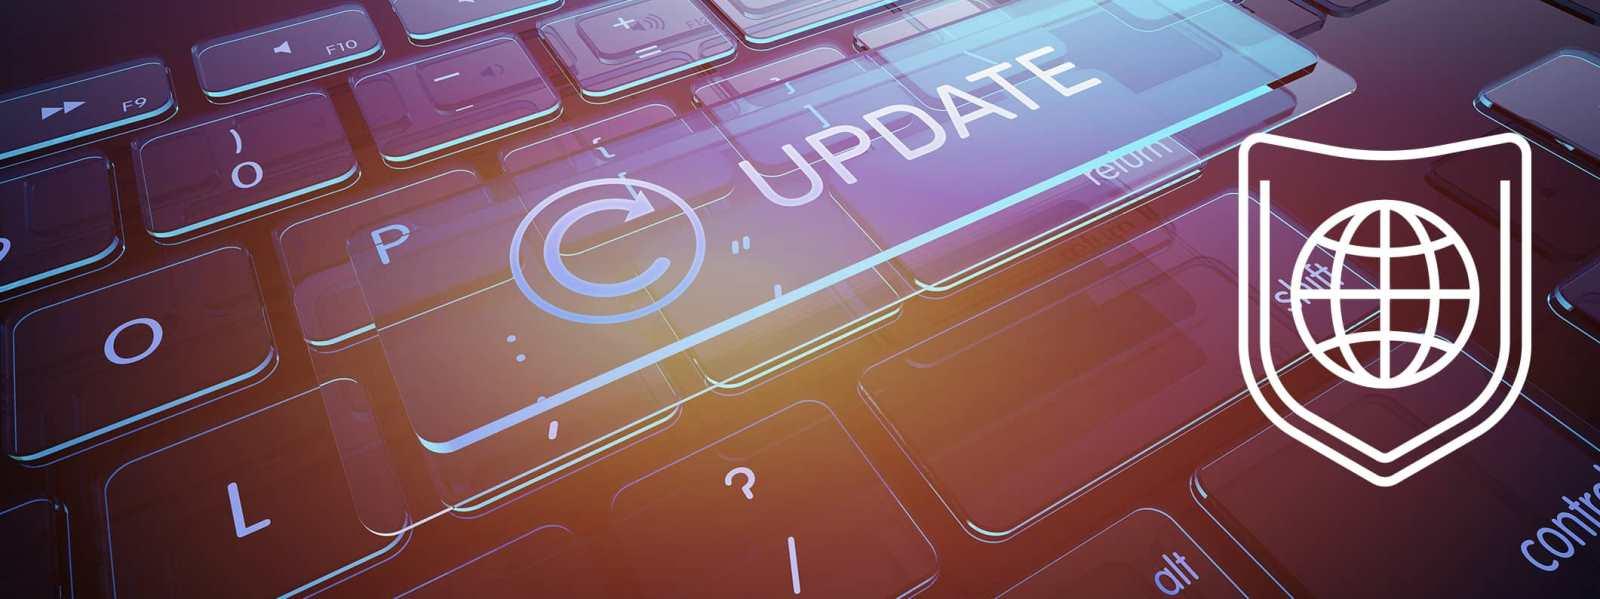 Updates And Anti Virus University Of Strathclyde Dvd Malware